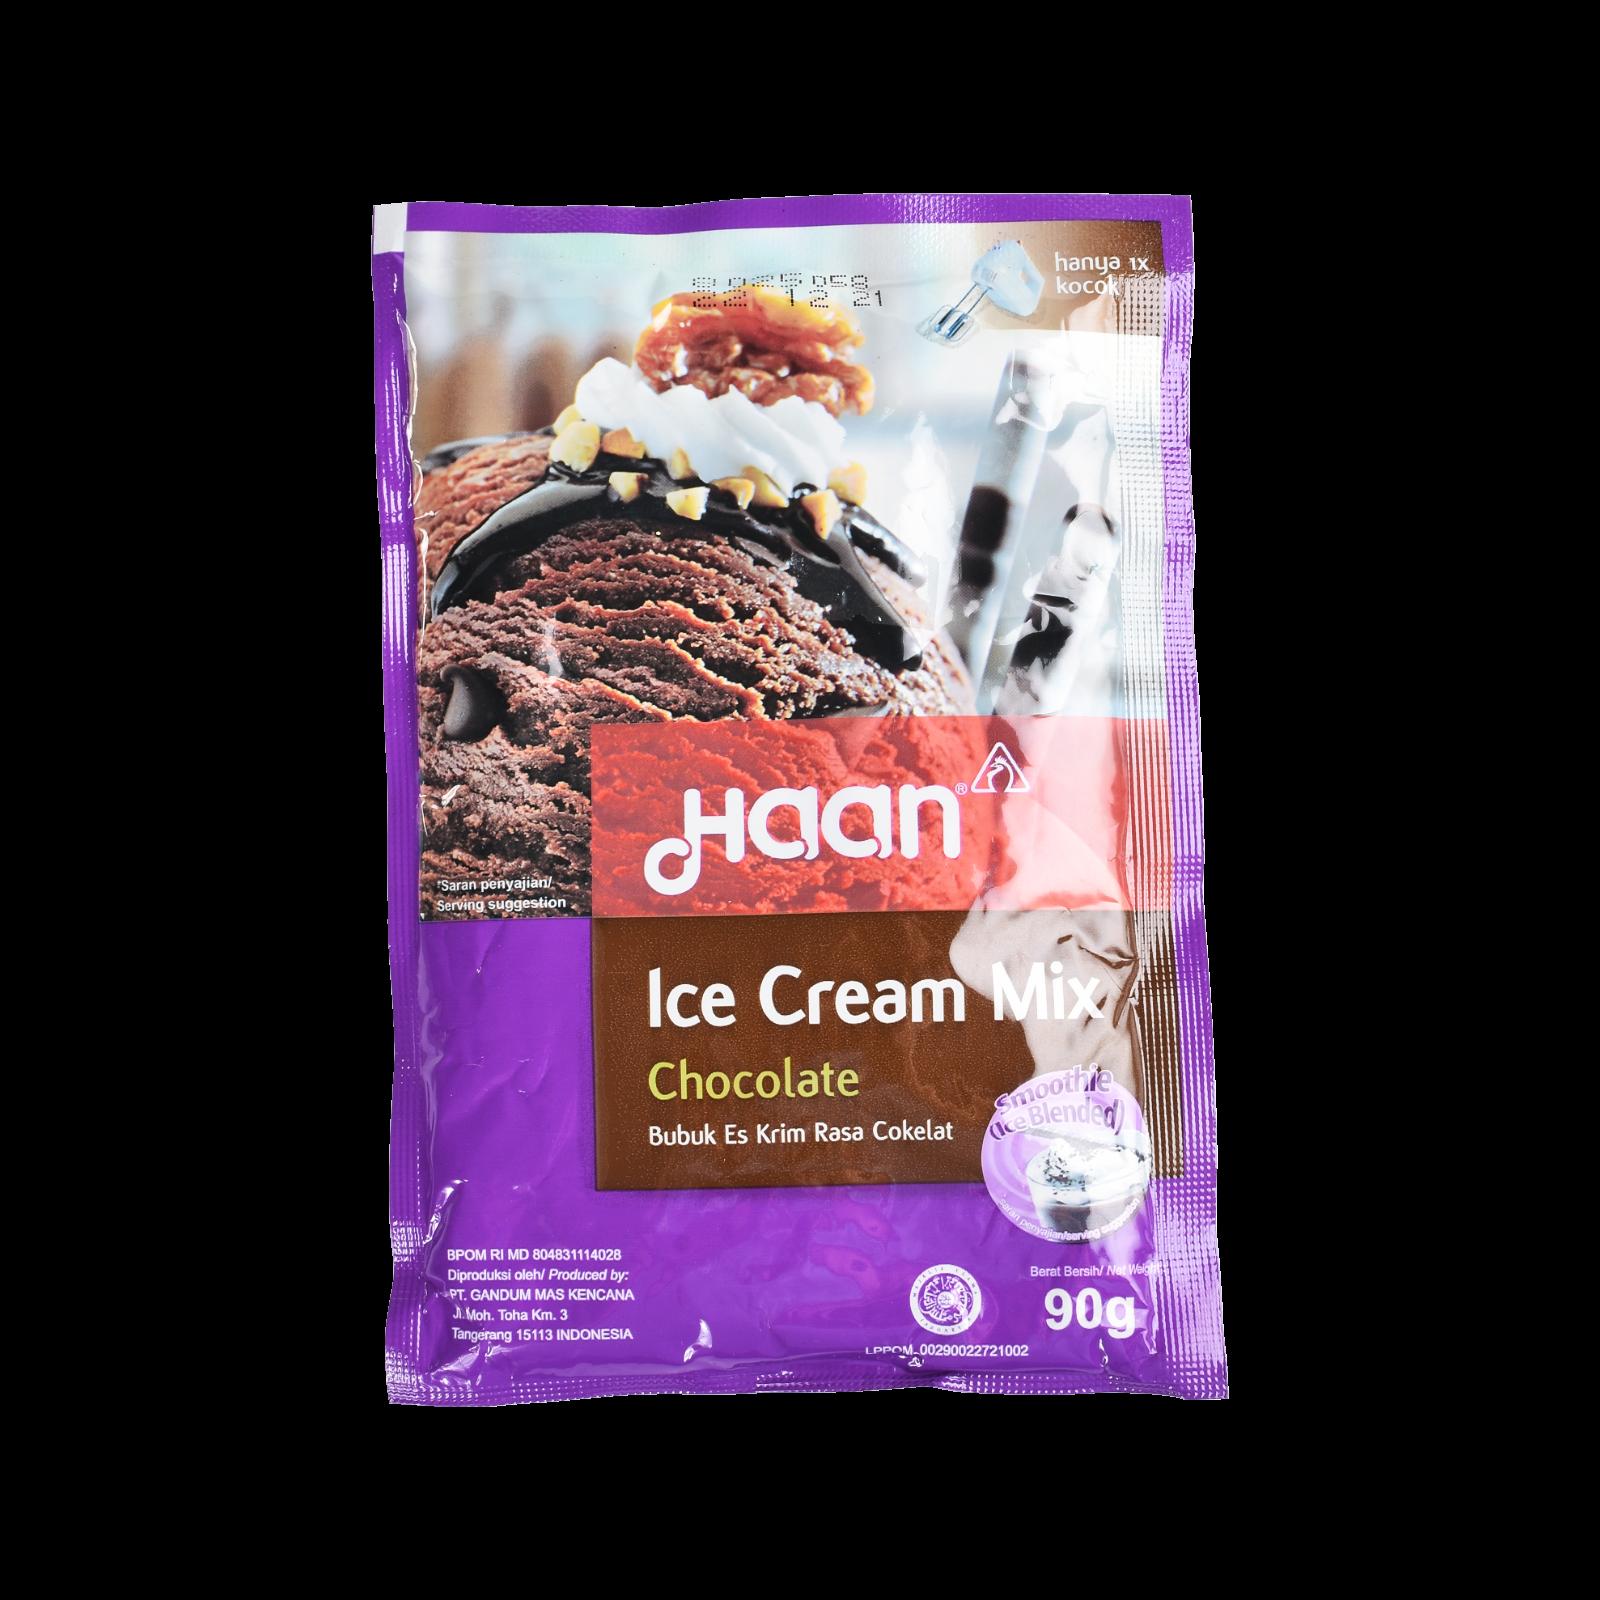 ice cream mix chocolate.png